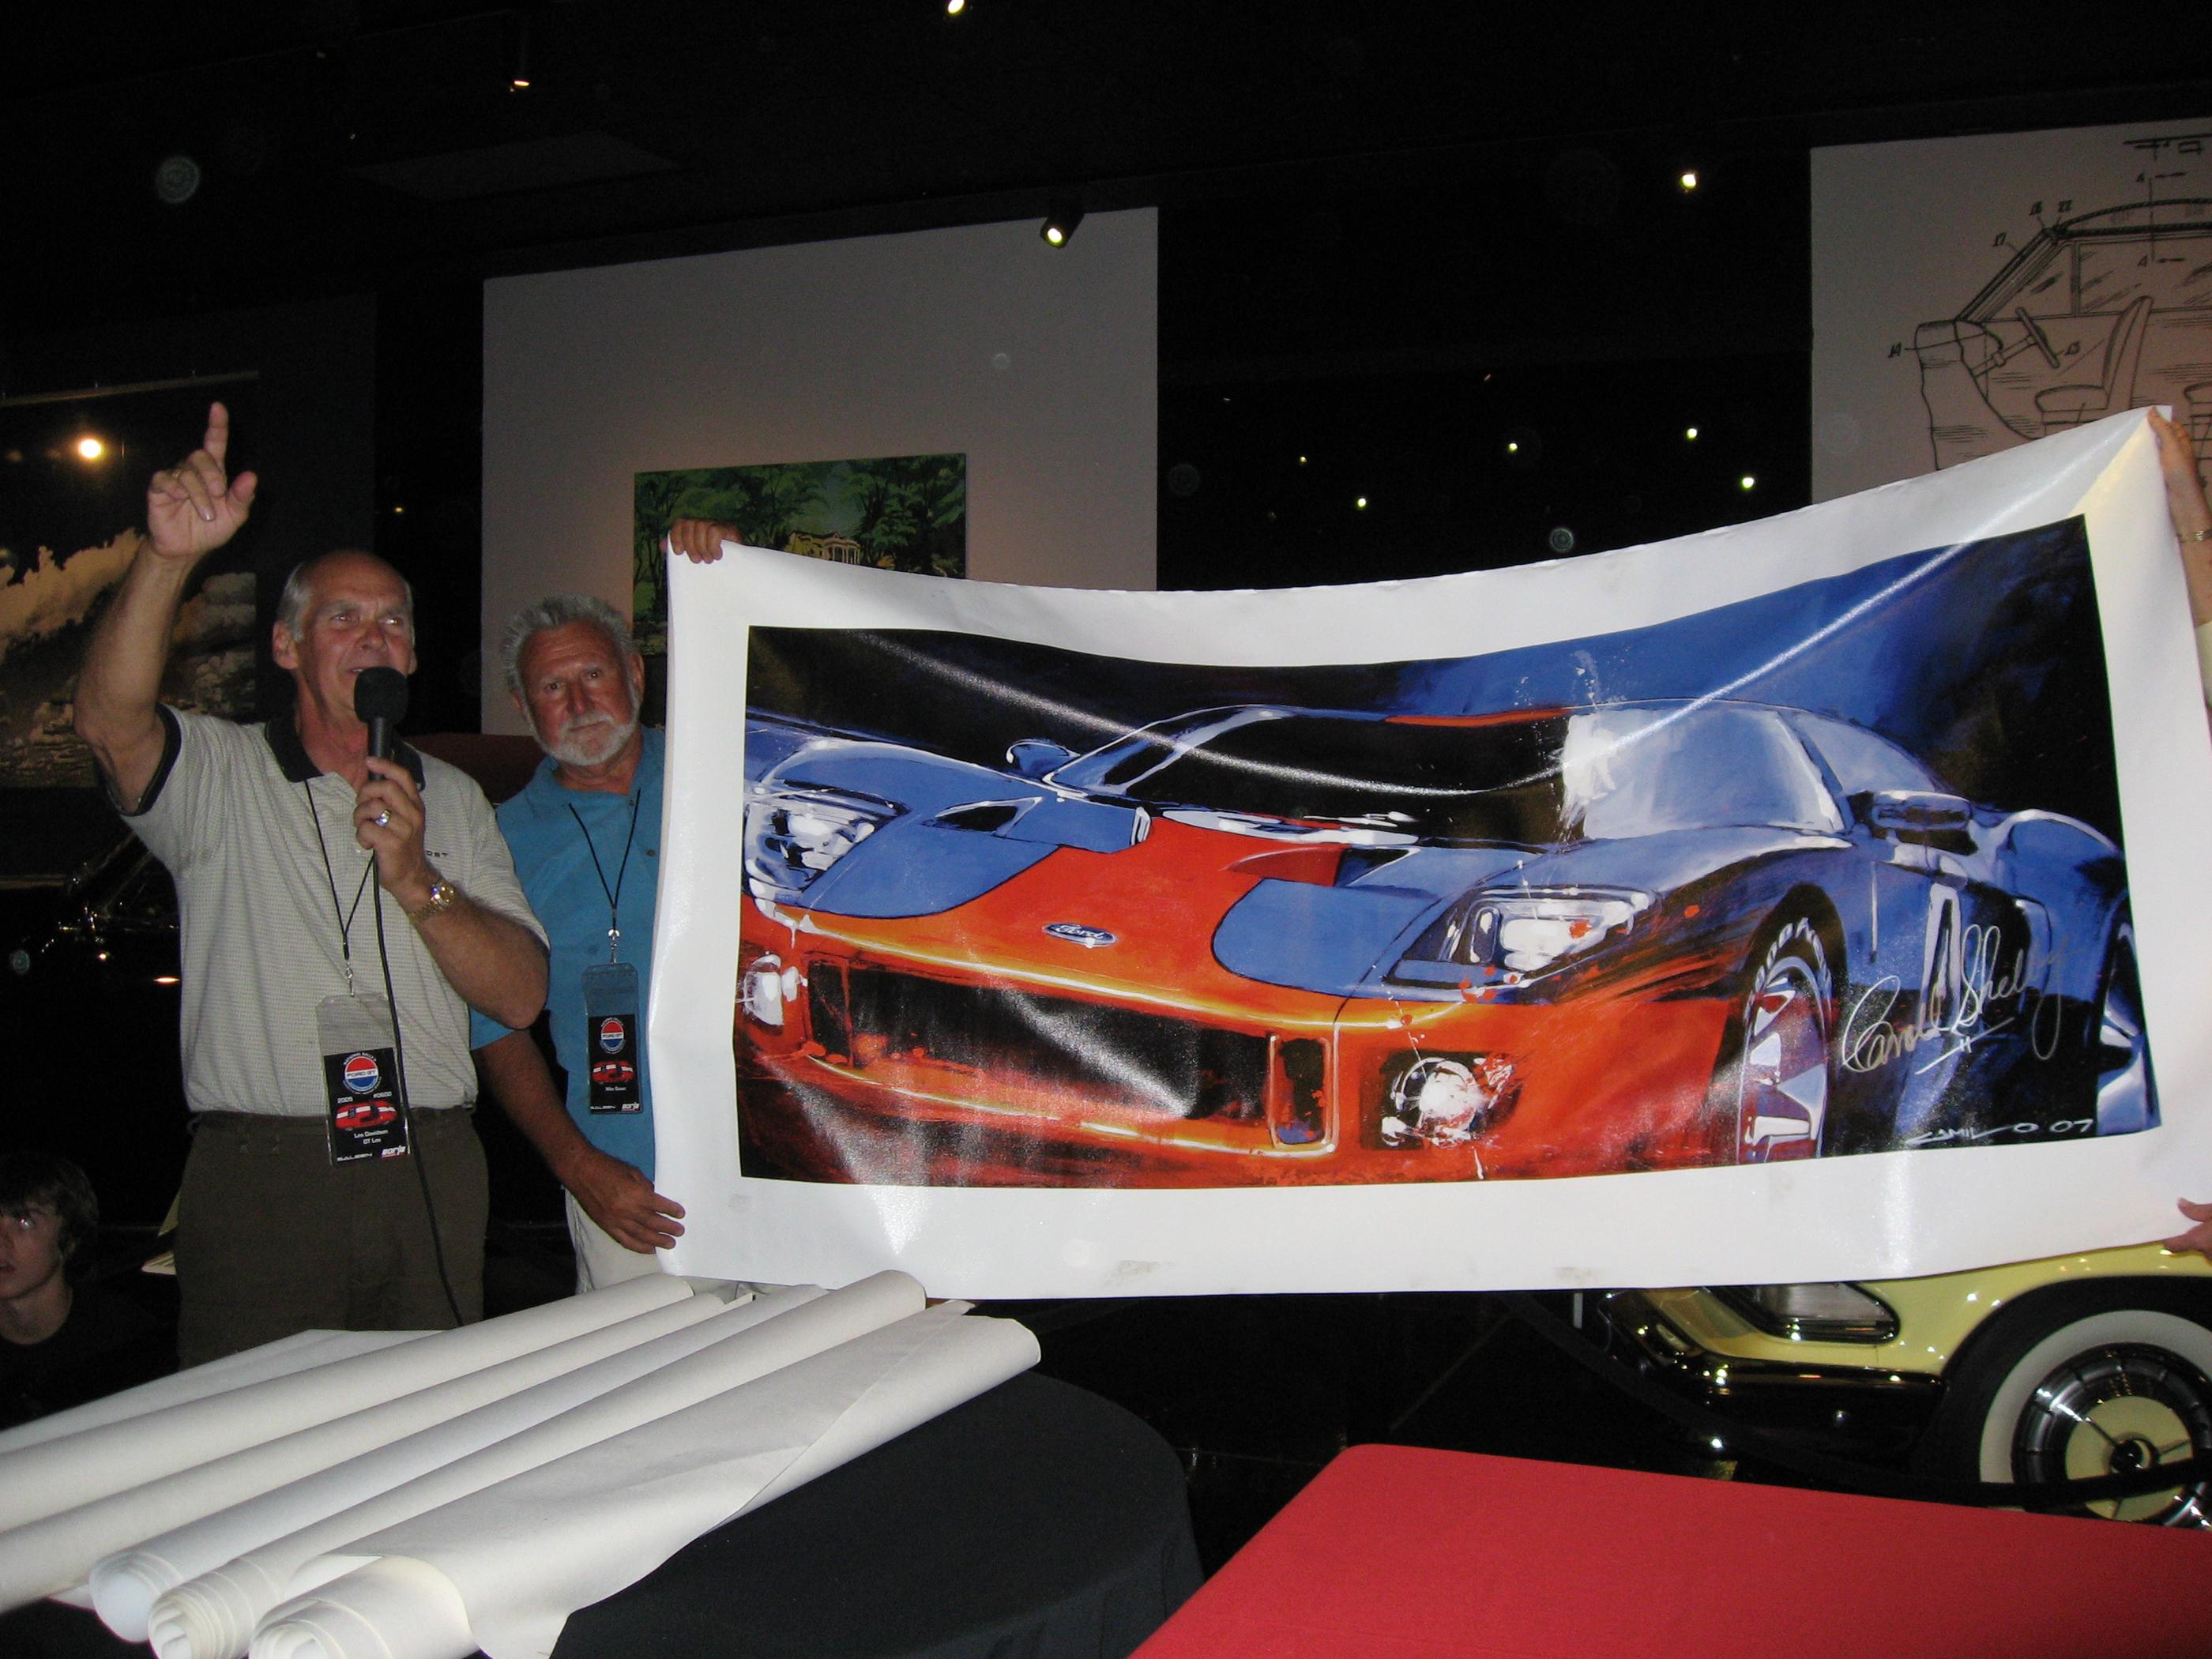 2005 Ford GT Long Term Owners Rally Camilo Pardo Art